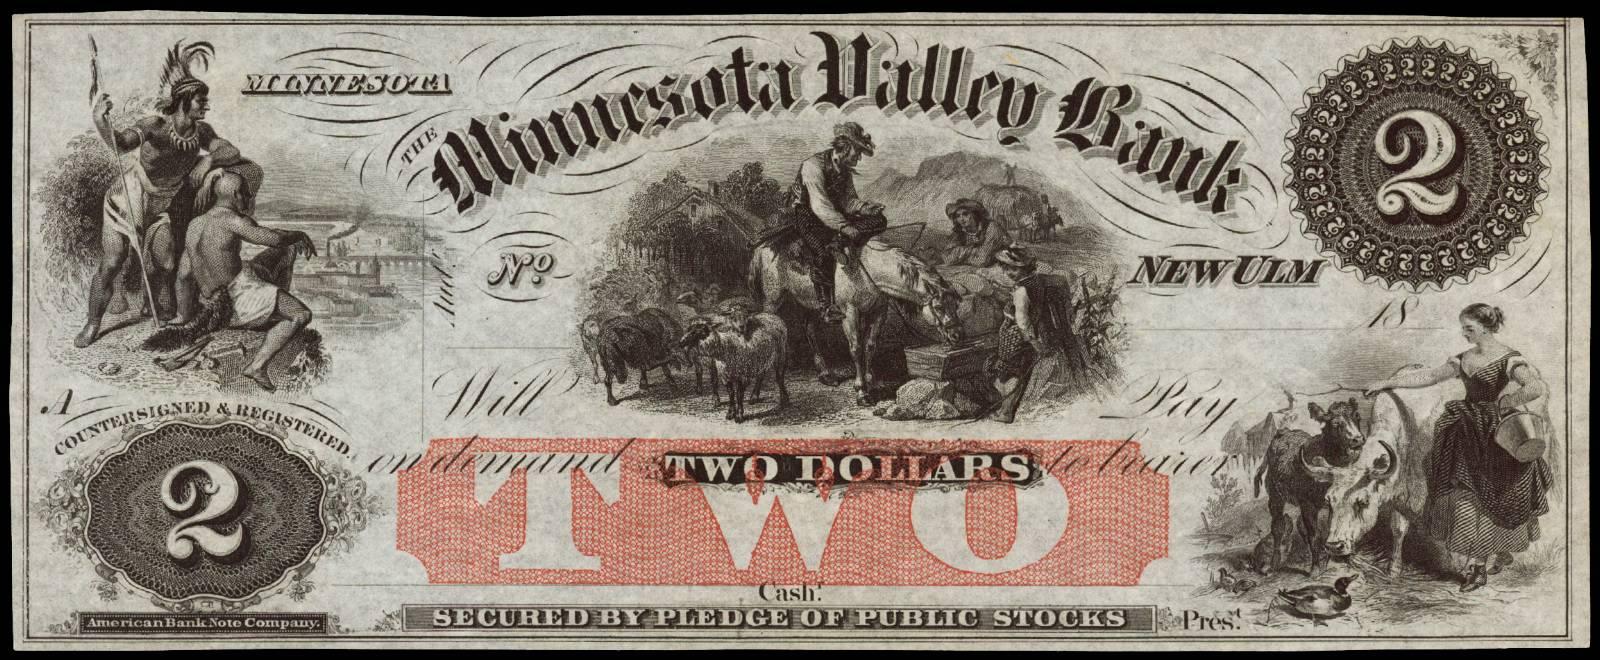 $2 Minnesota Valley Bank